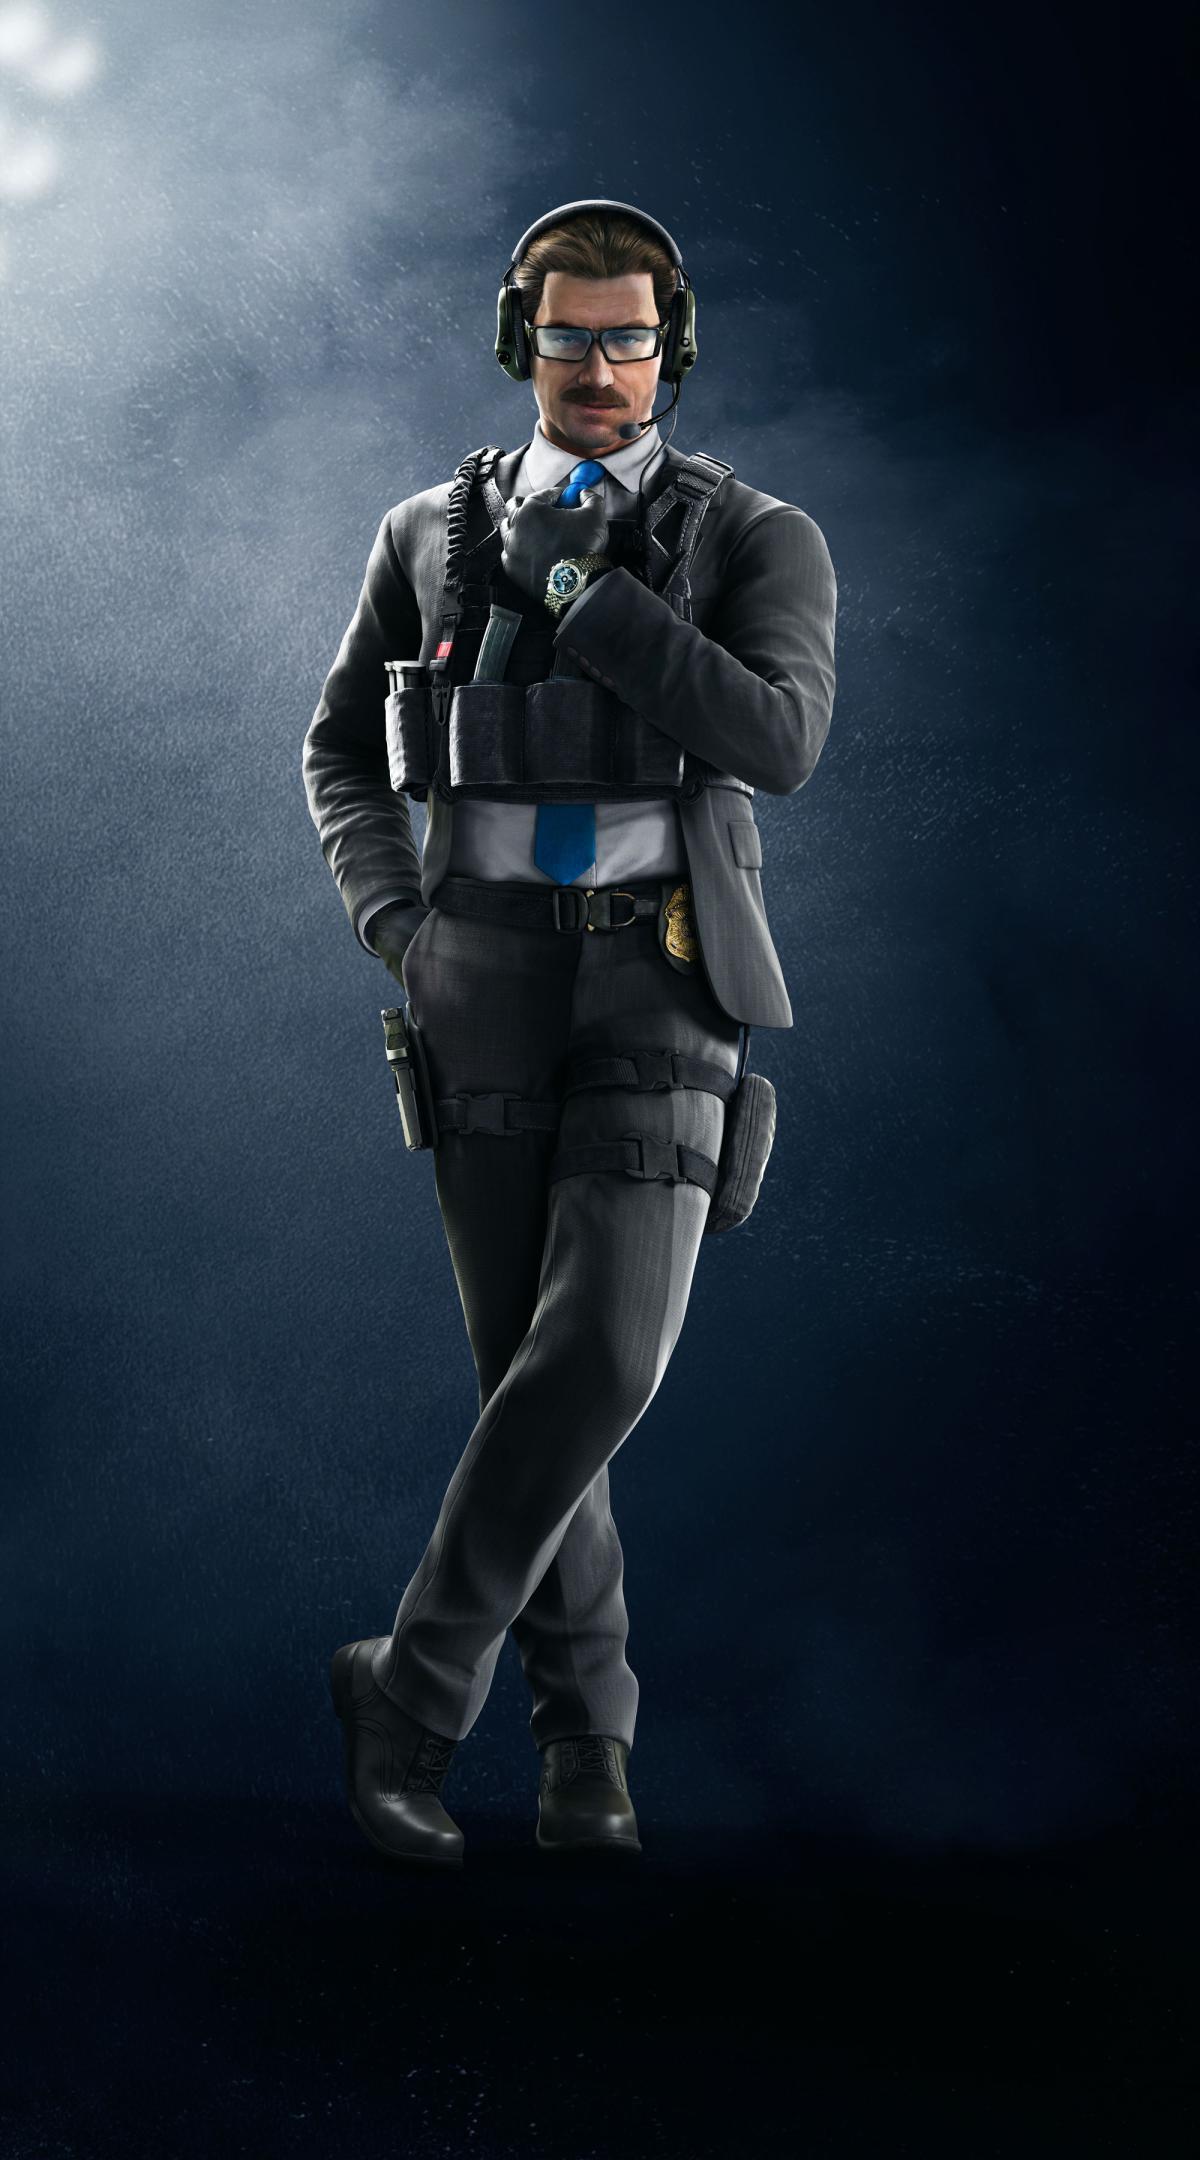 Warden R6S